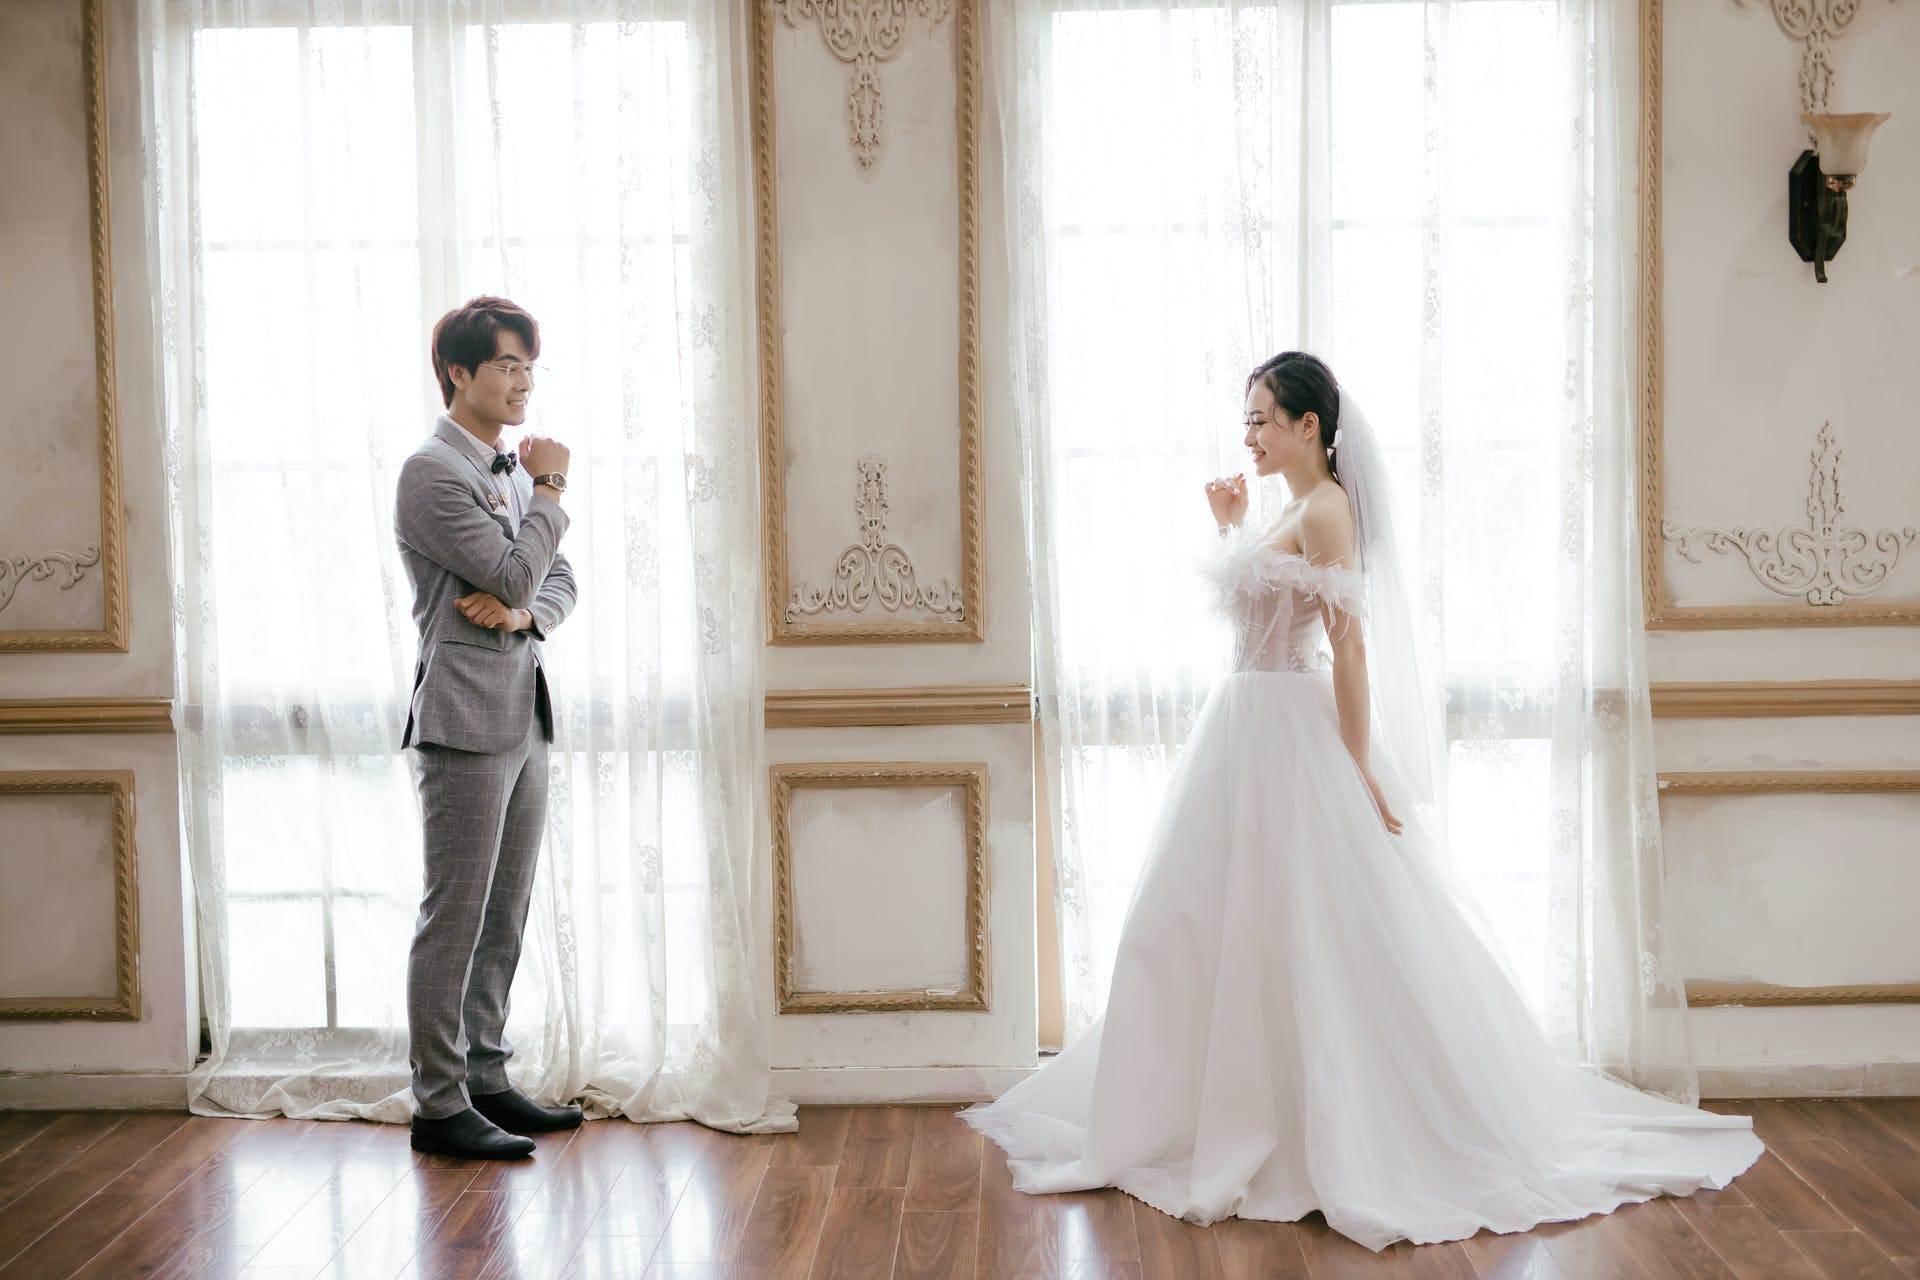 Wedding-Dresses-2560